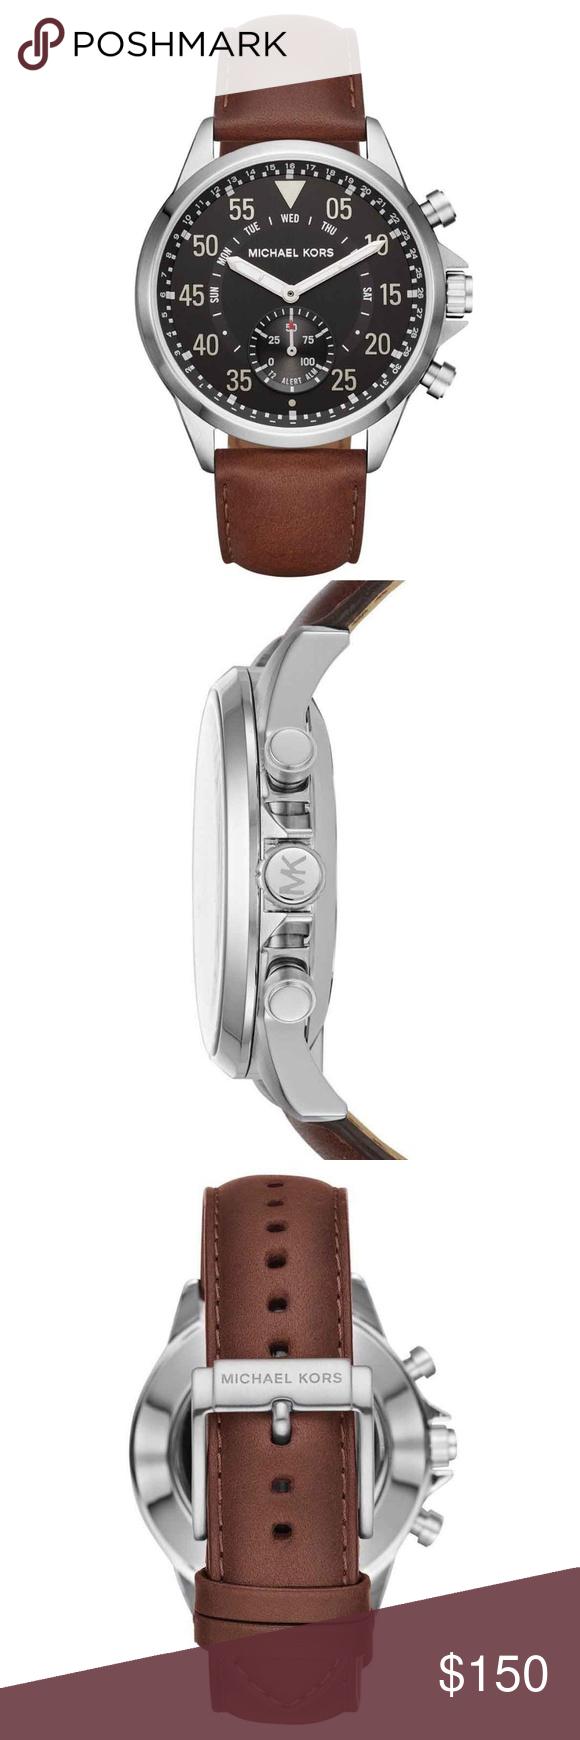 3e3281be6265 Michael Kors Access Men s Gage Hybrid Smartwatch Michael Kors Access Men s  Gage Brown Leather Hybrid Smartwatch